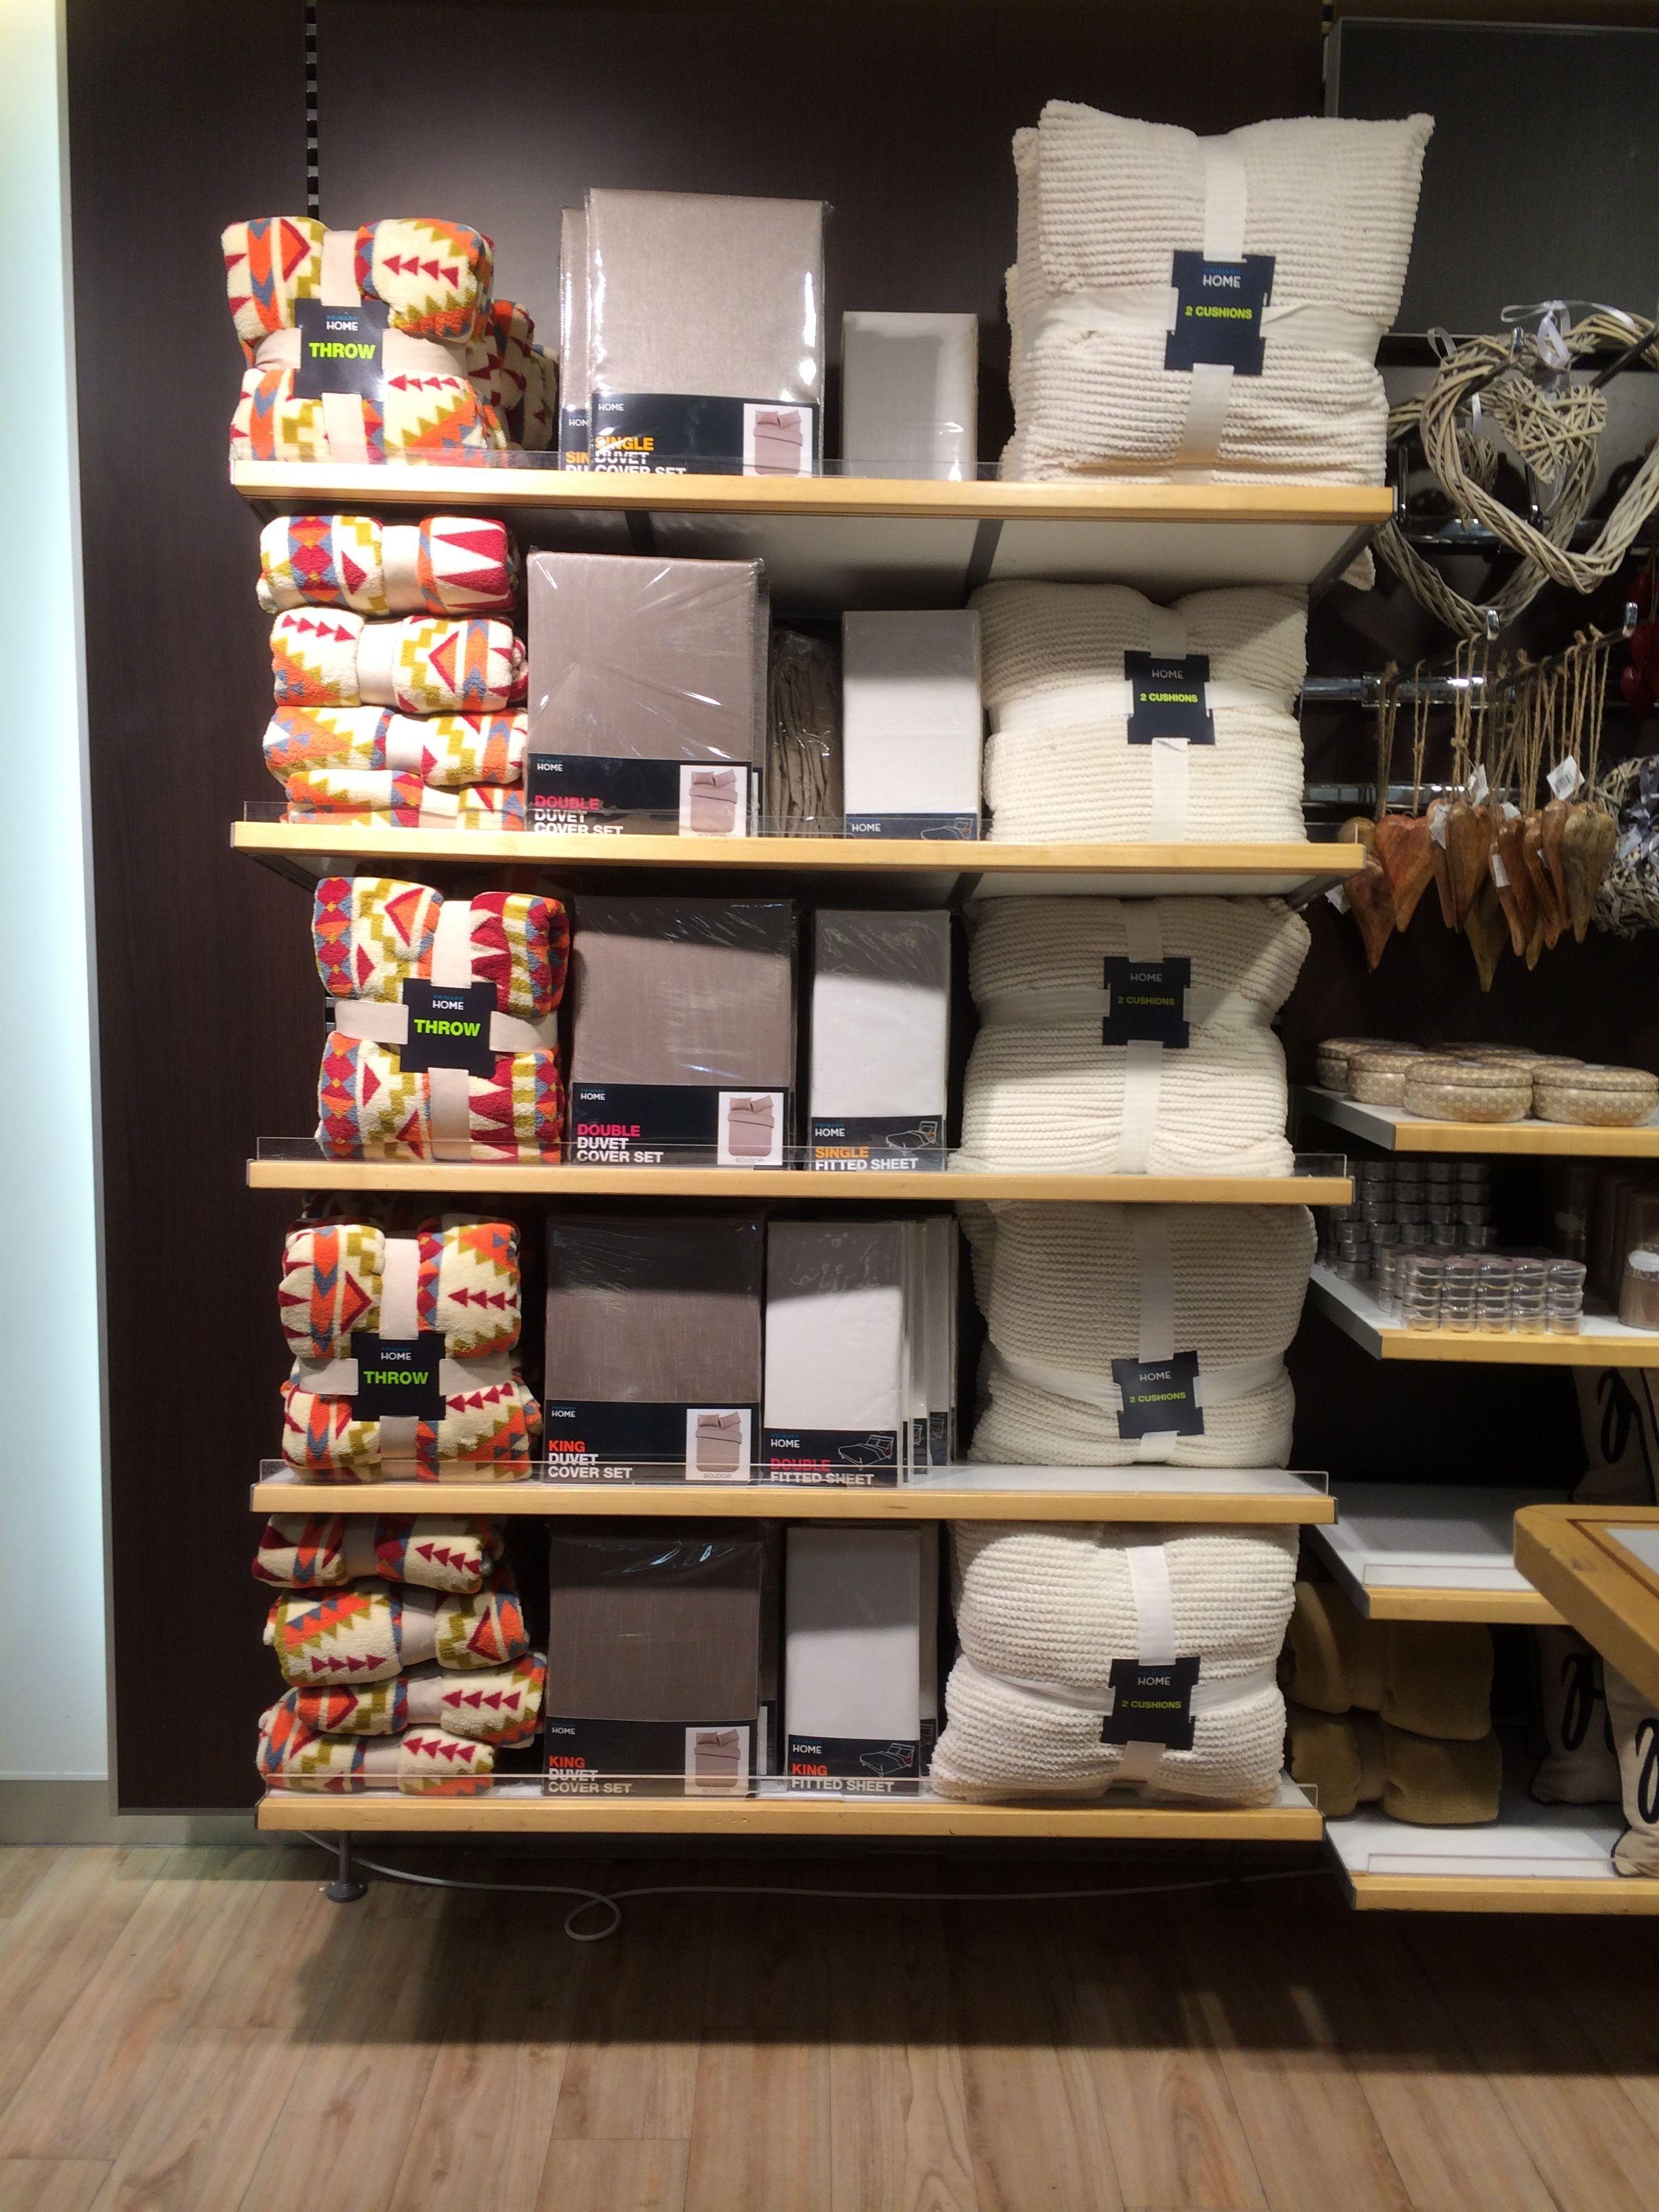 Primark - Nottingham - Homewares - Home - Lifestyle - Layout - Landscape - Visual Merchandising ...